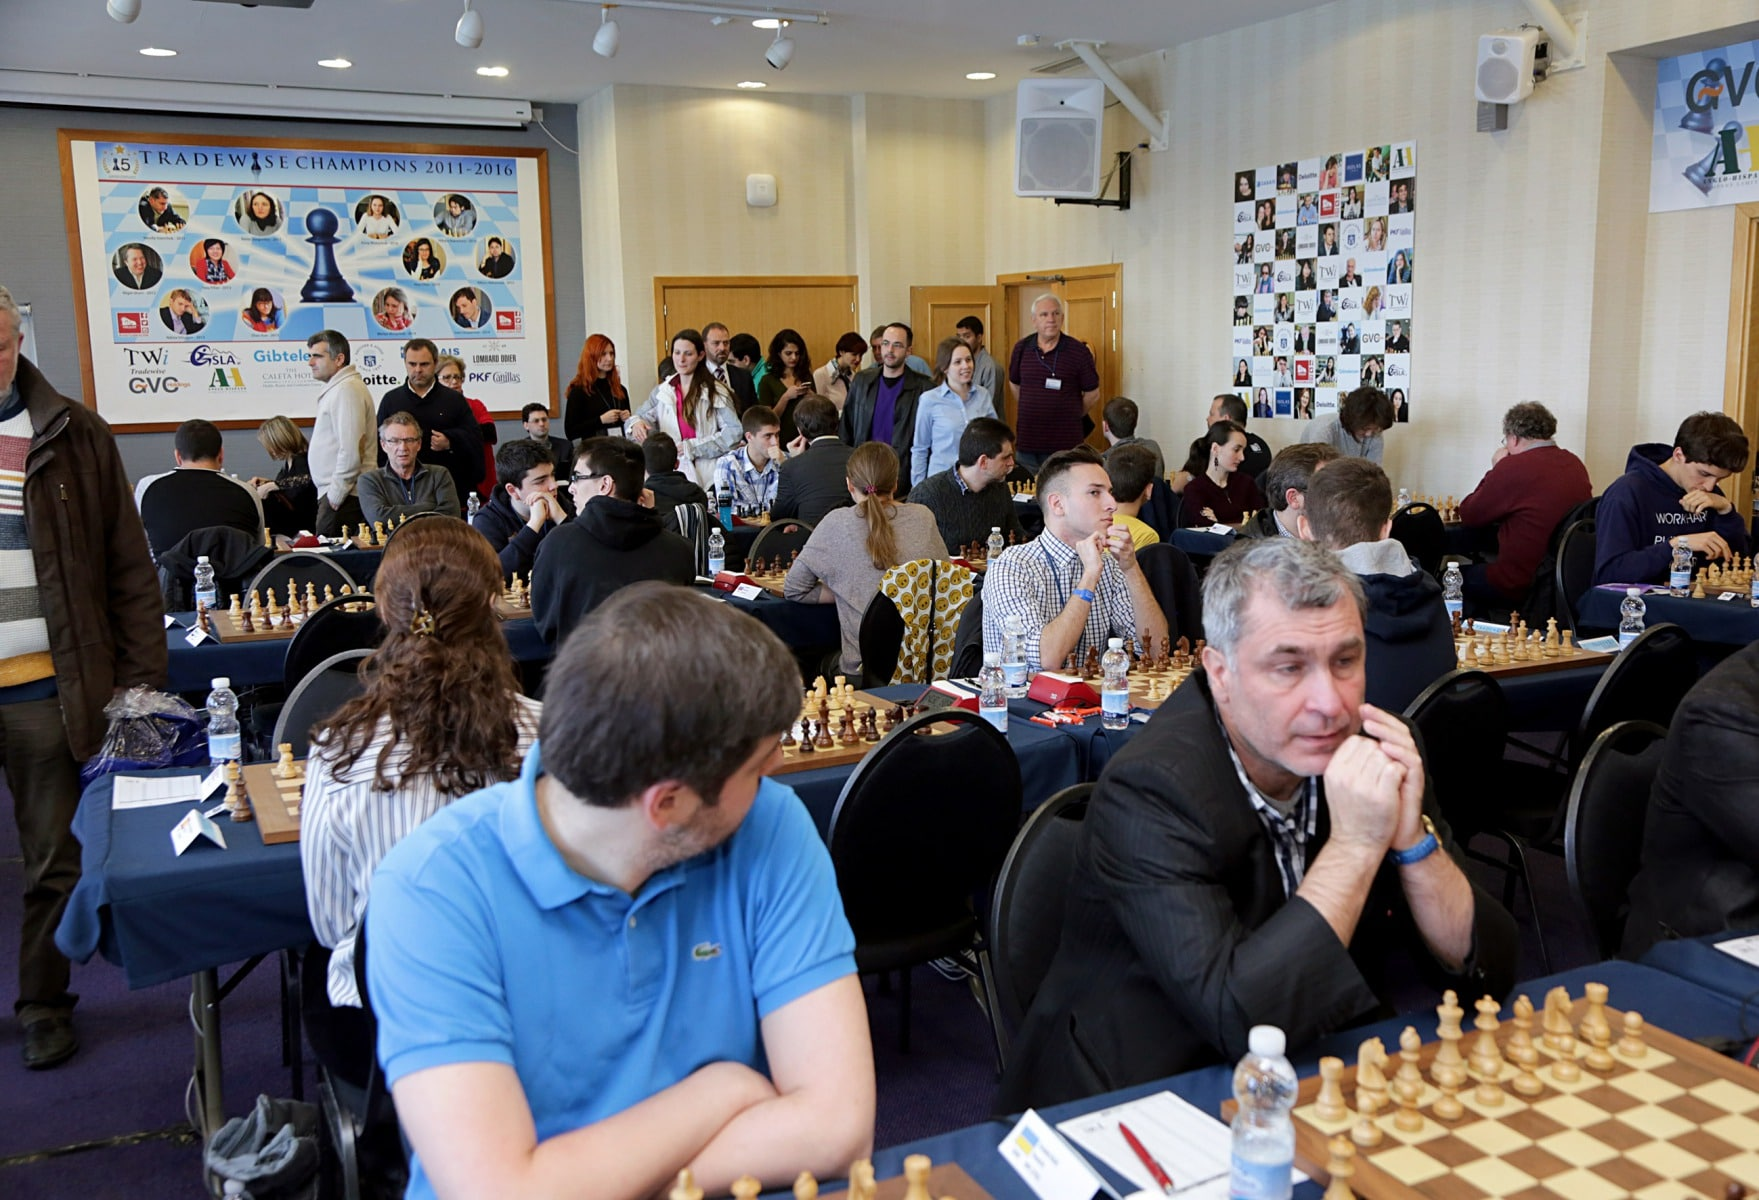 27-ene-17-fabin-picardo-visita-el-open-de-gibraltar-de-ajedrez-4_31710620034_o